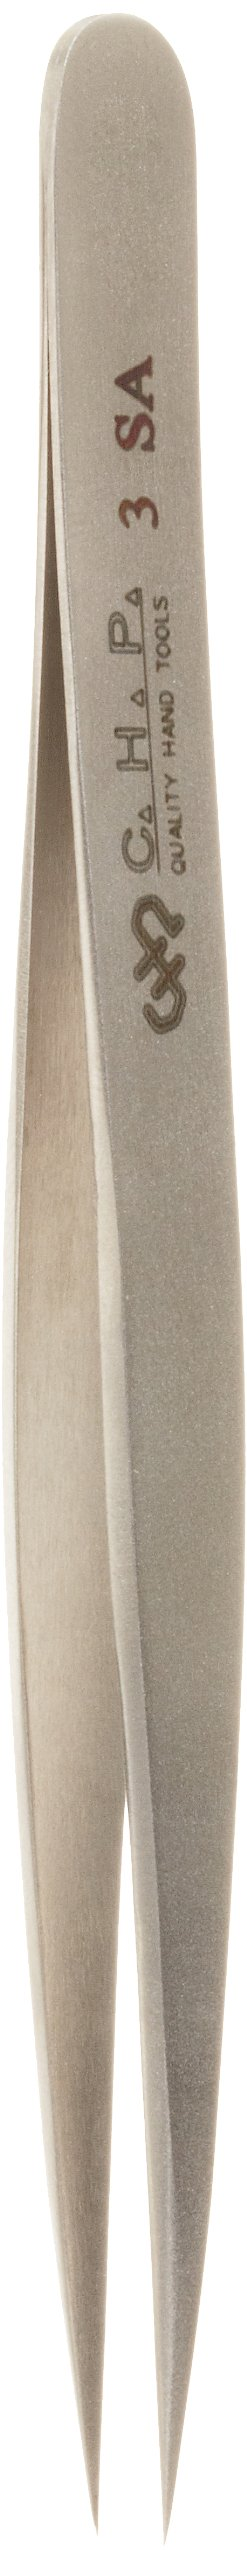 Hakko CHP 3-SA Stainless Steel Non-Magnetic